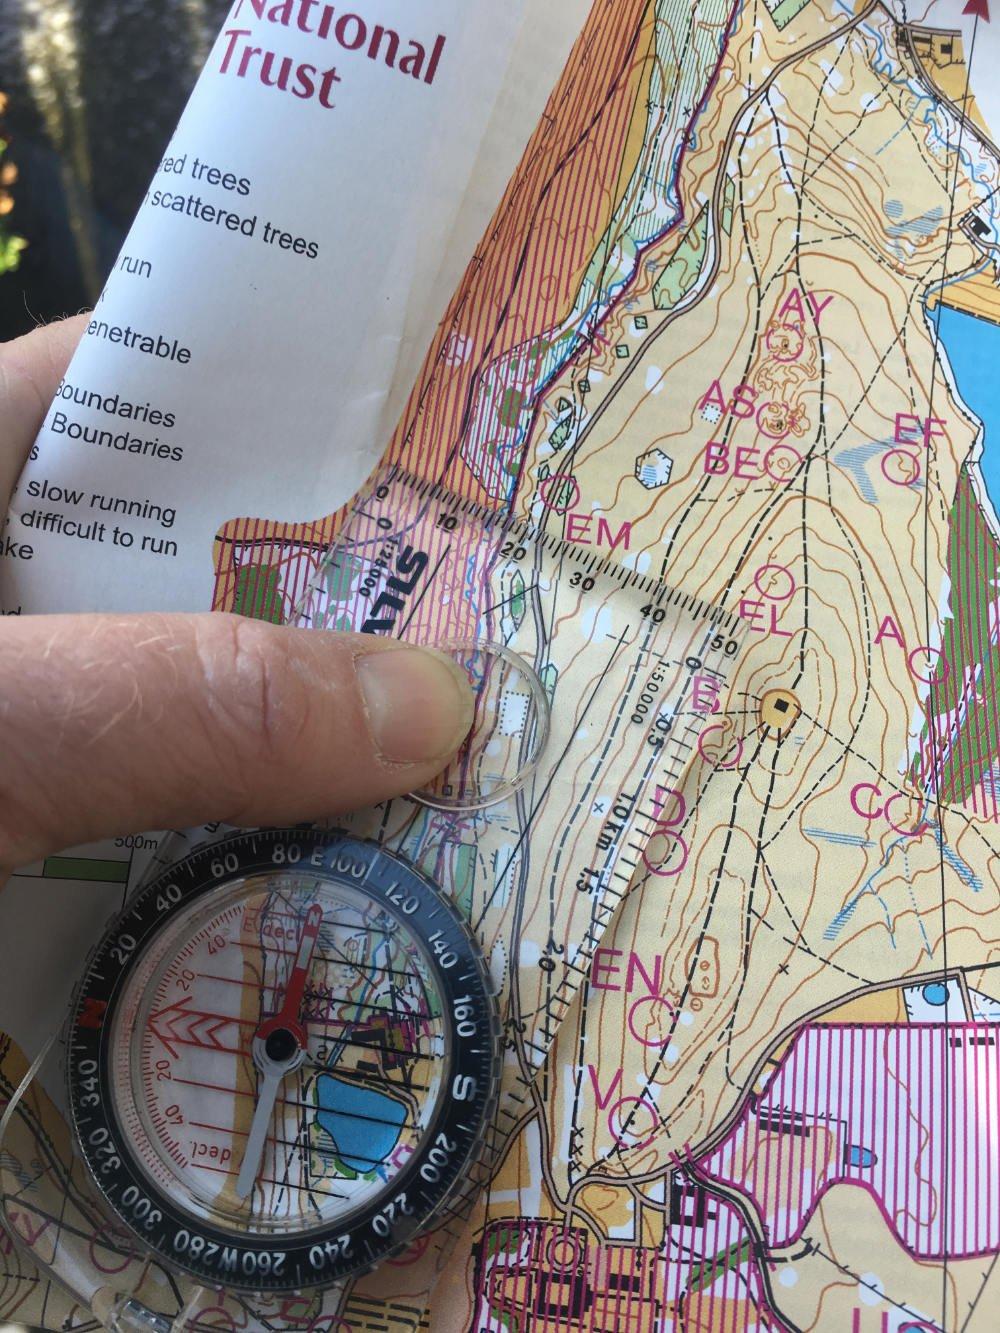 Compass on Orienteering map